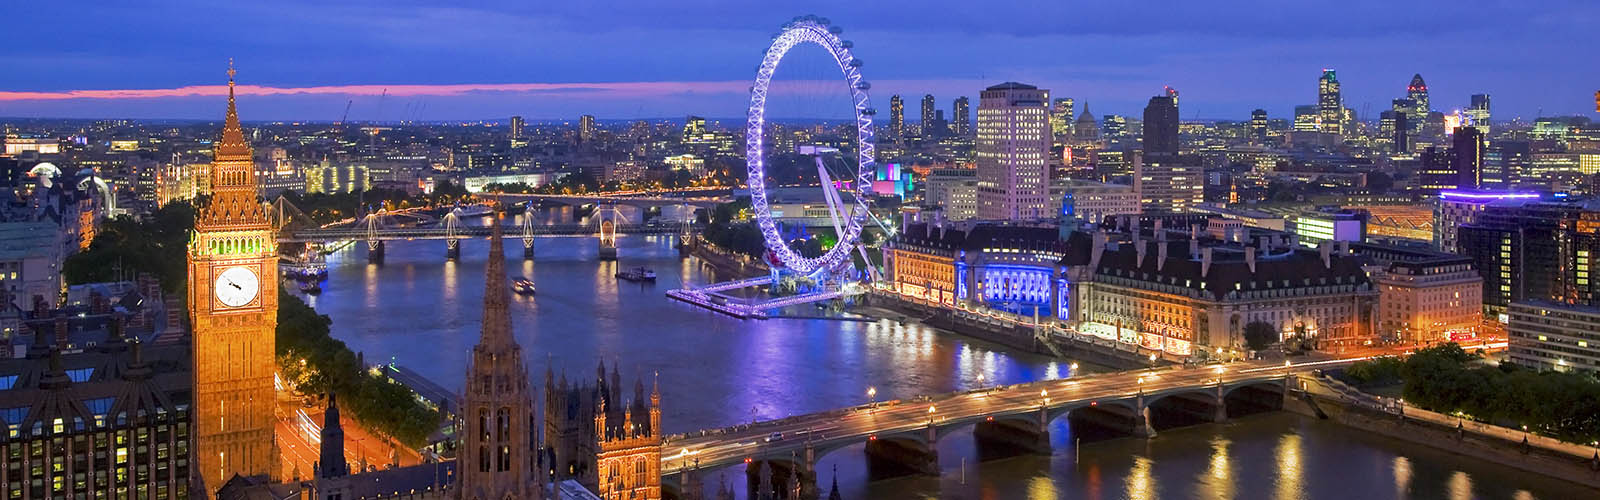 Panaramic View Of London